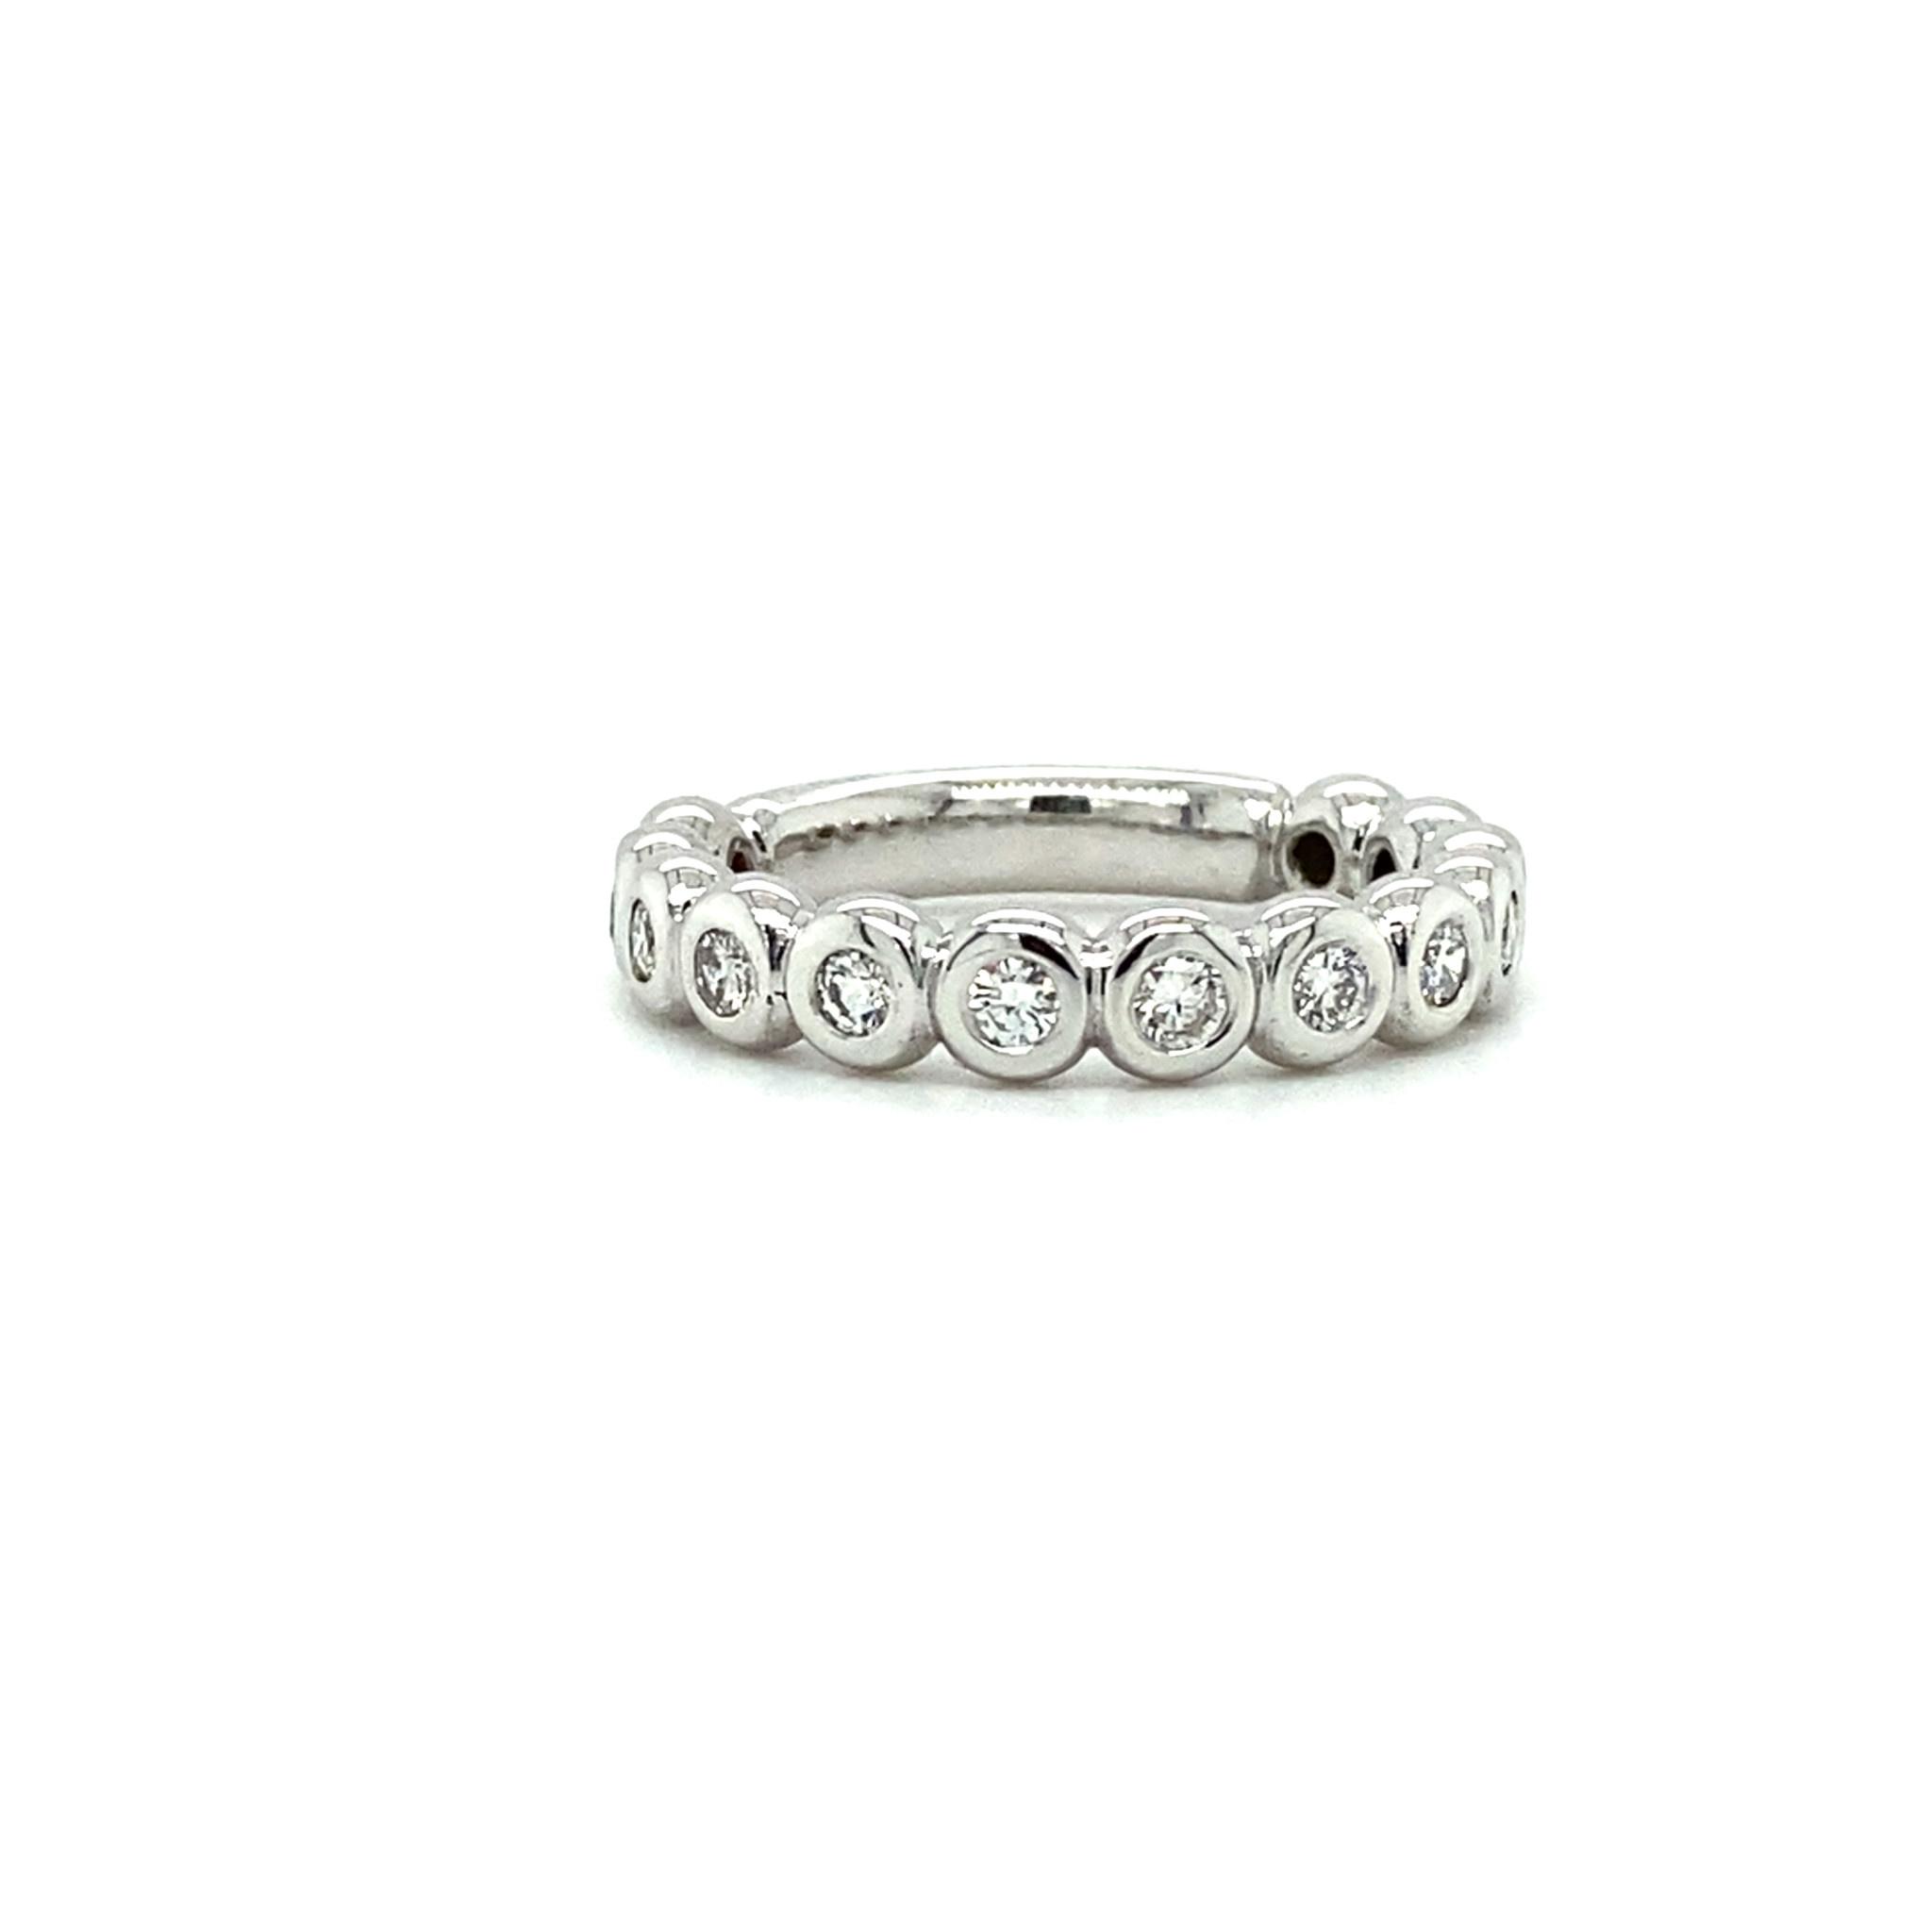 ROEMER by Bregje Witgouden ring met diamant 0.52ct